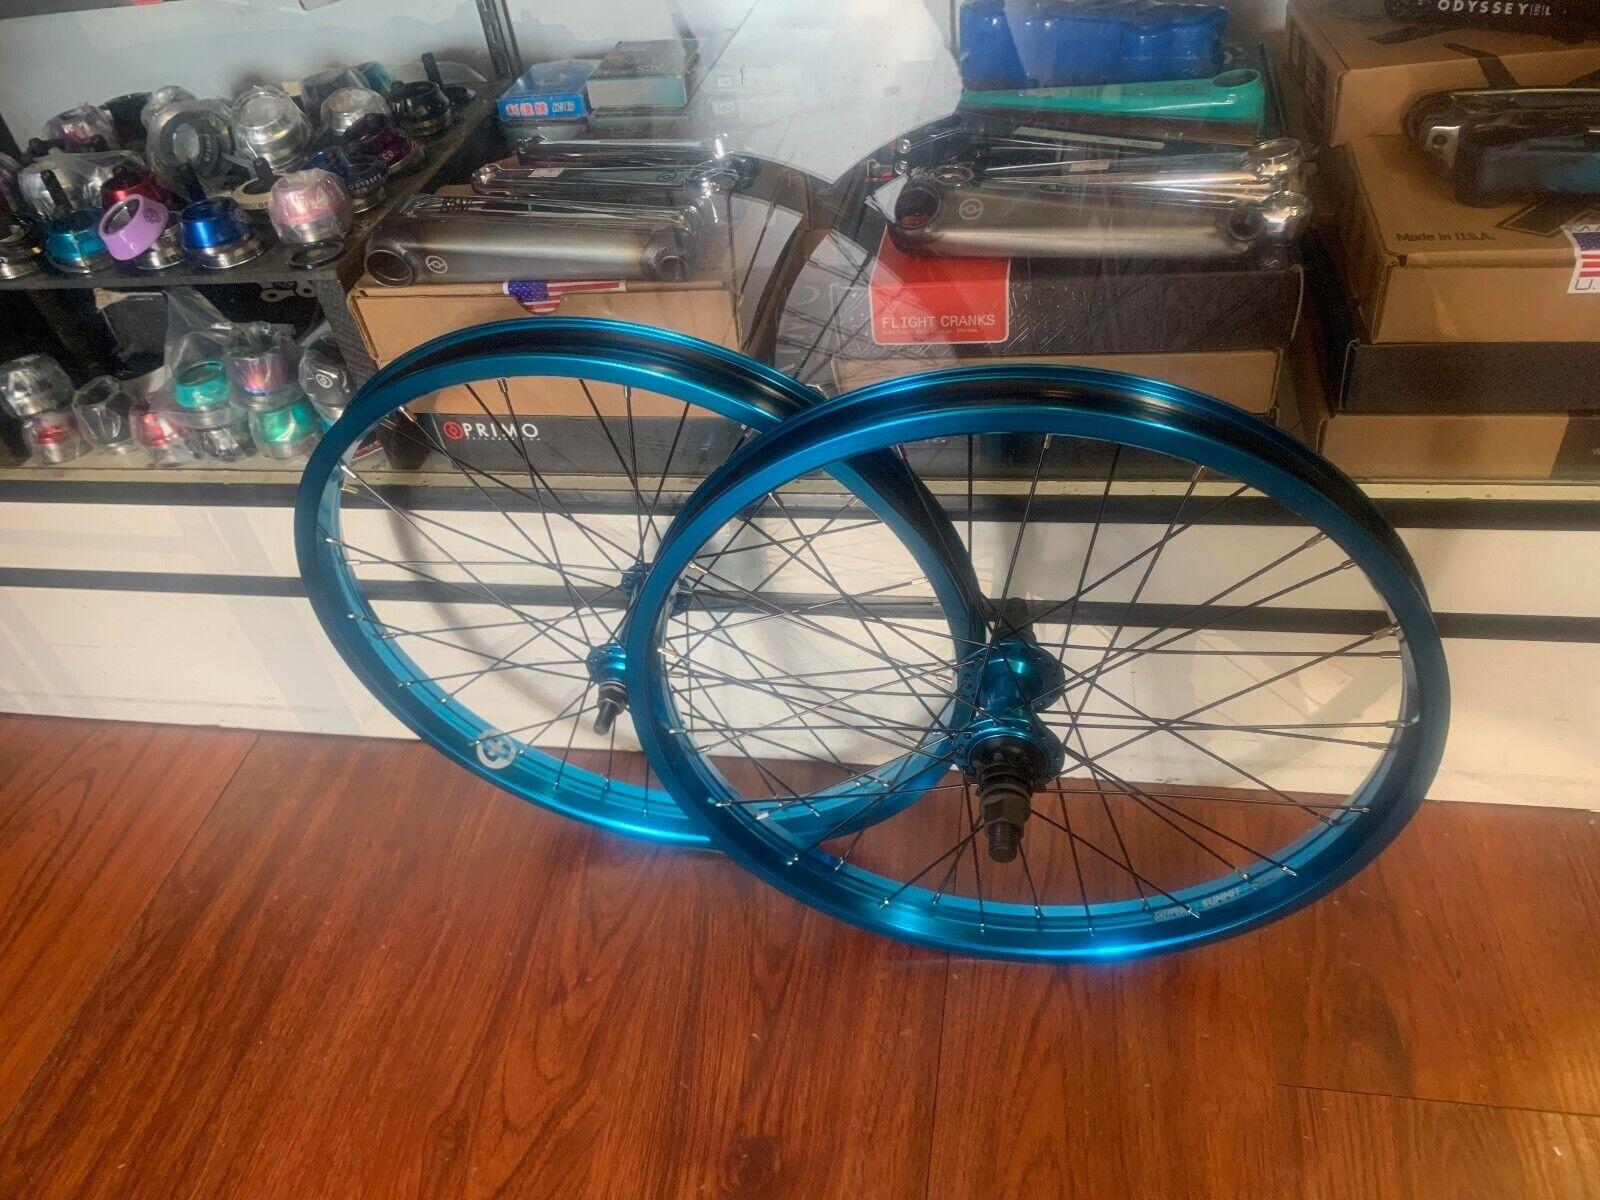 SALT PLUS EVEREST 9 CASSETTE  COMPLETE WHEEL SET blueE 20  WHEELS BMX BIKE SUMMIT  get the latest